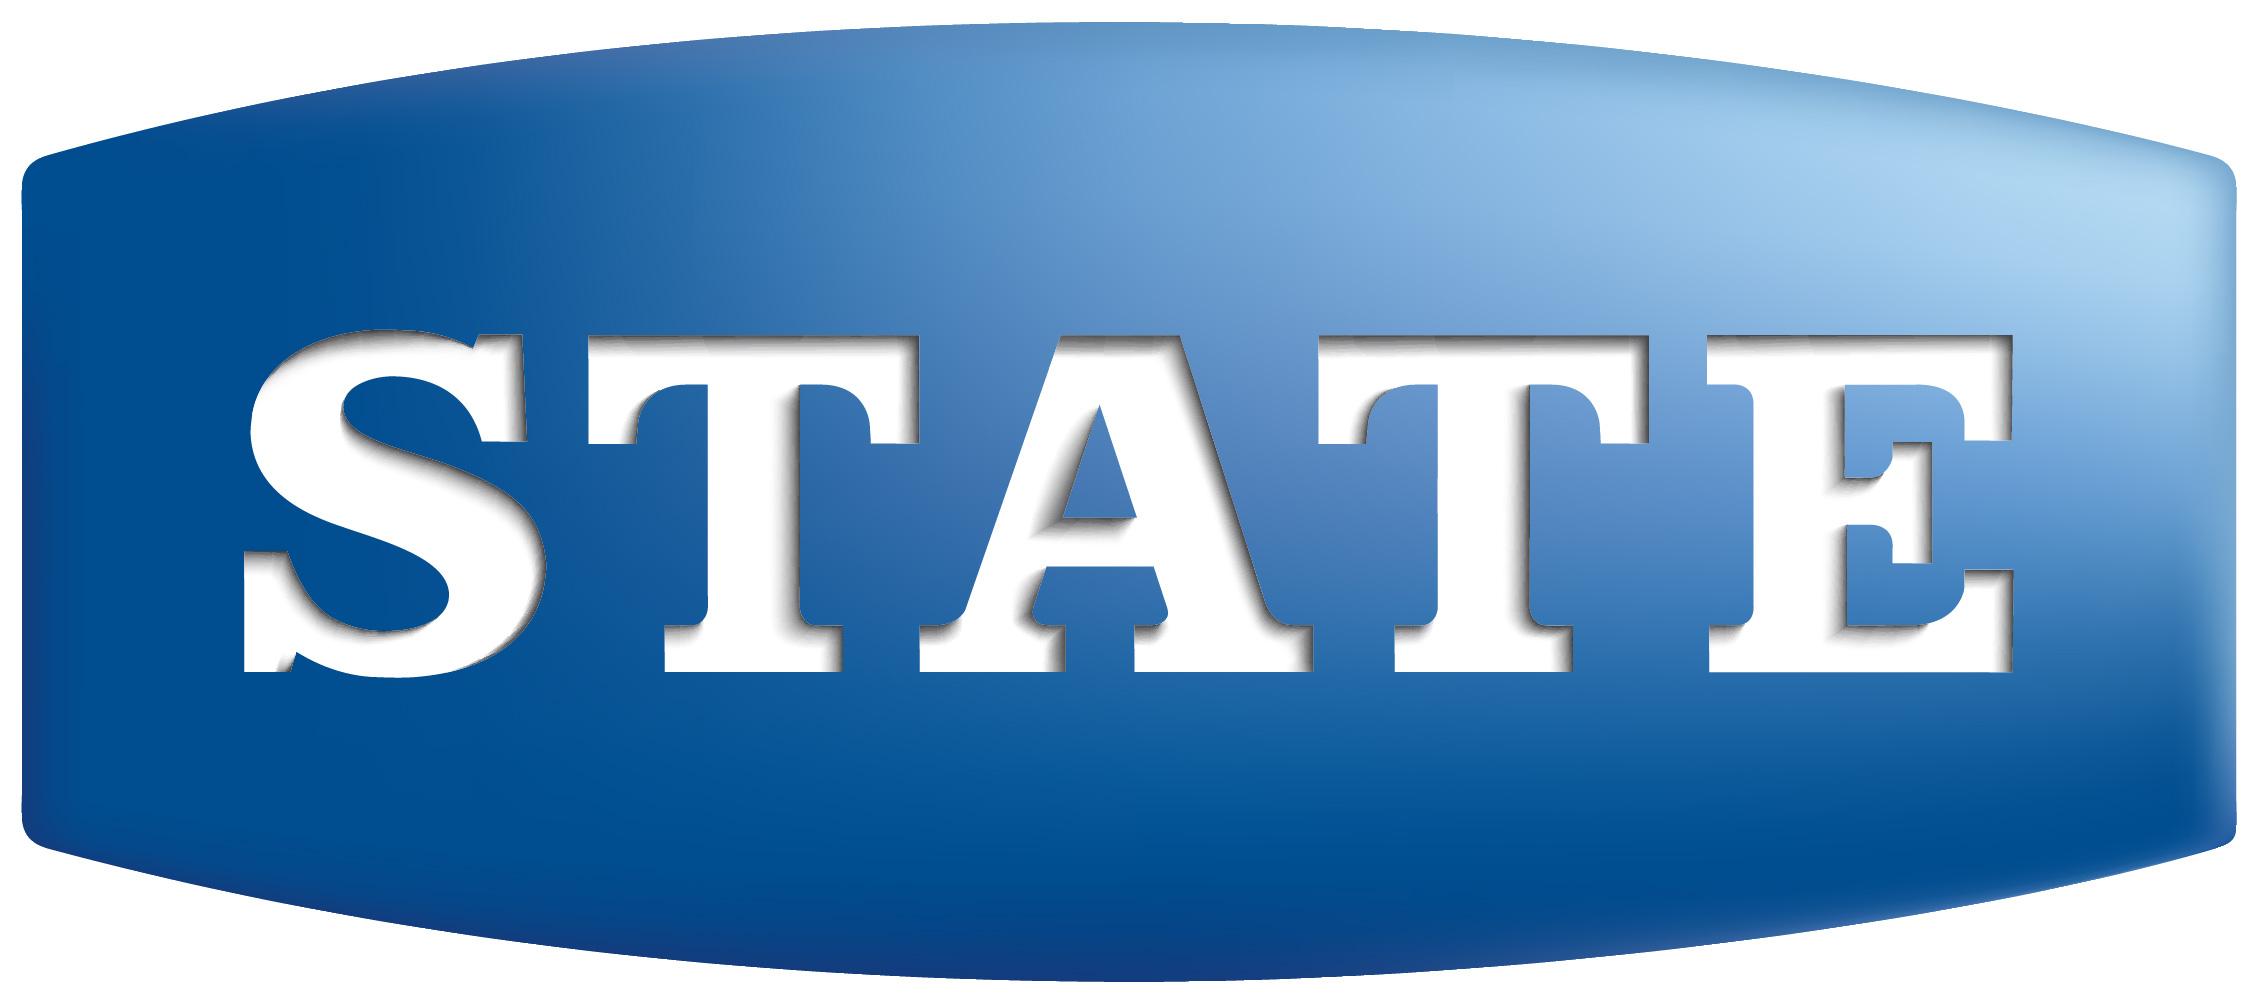 STATE High Res logo.jpg